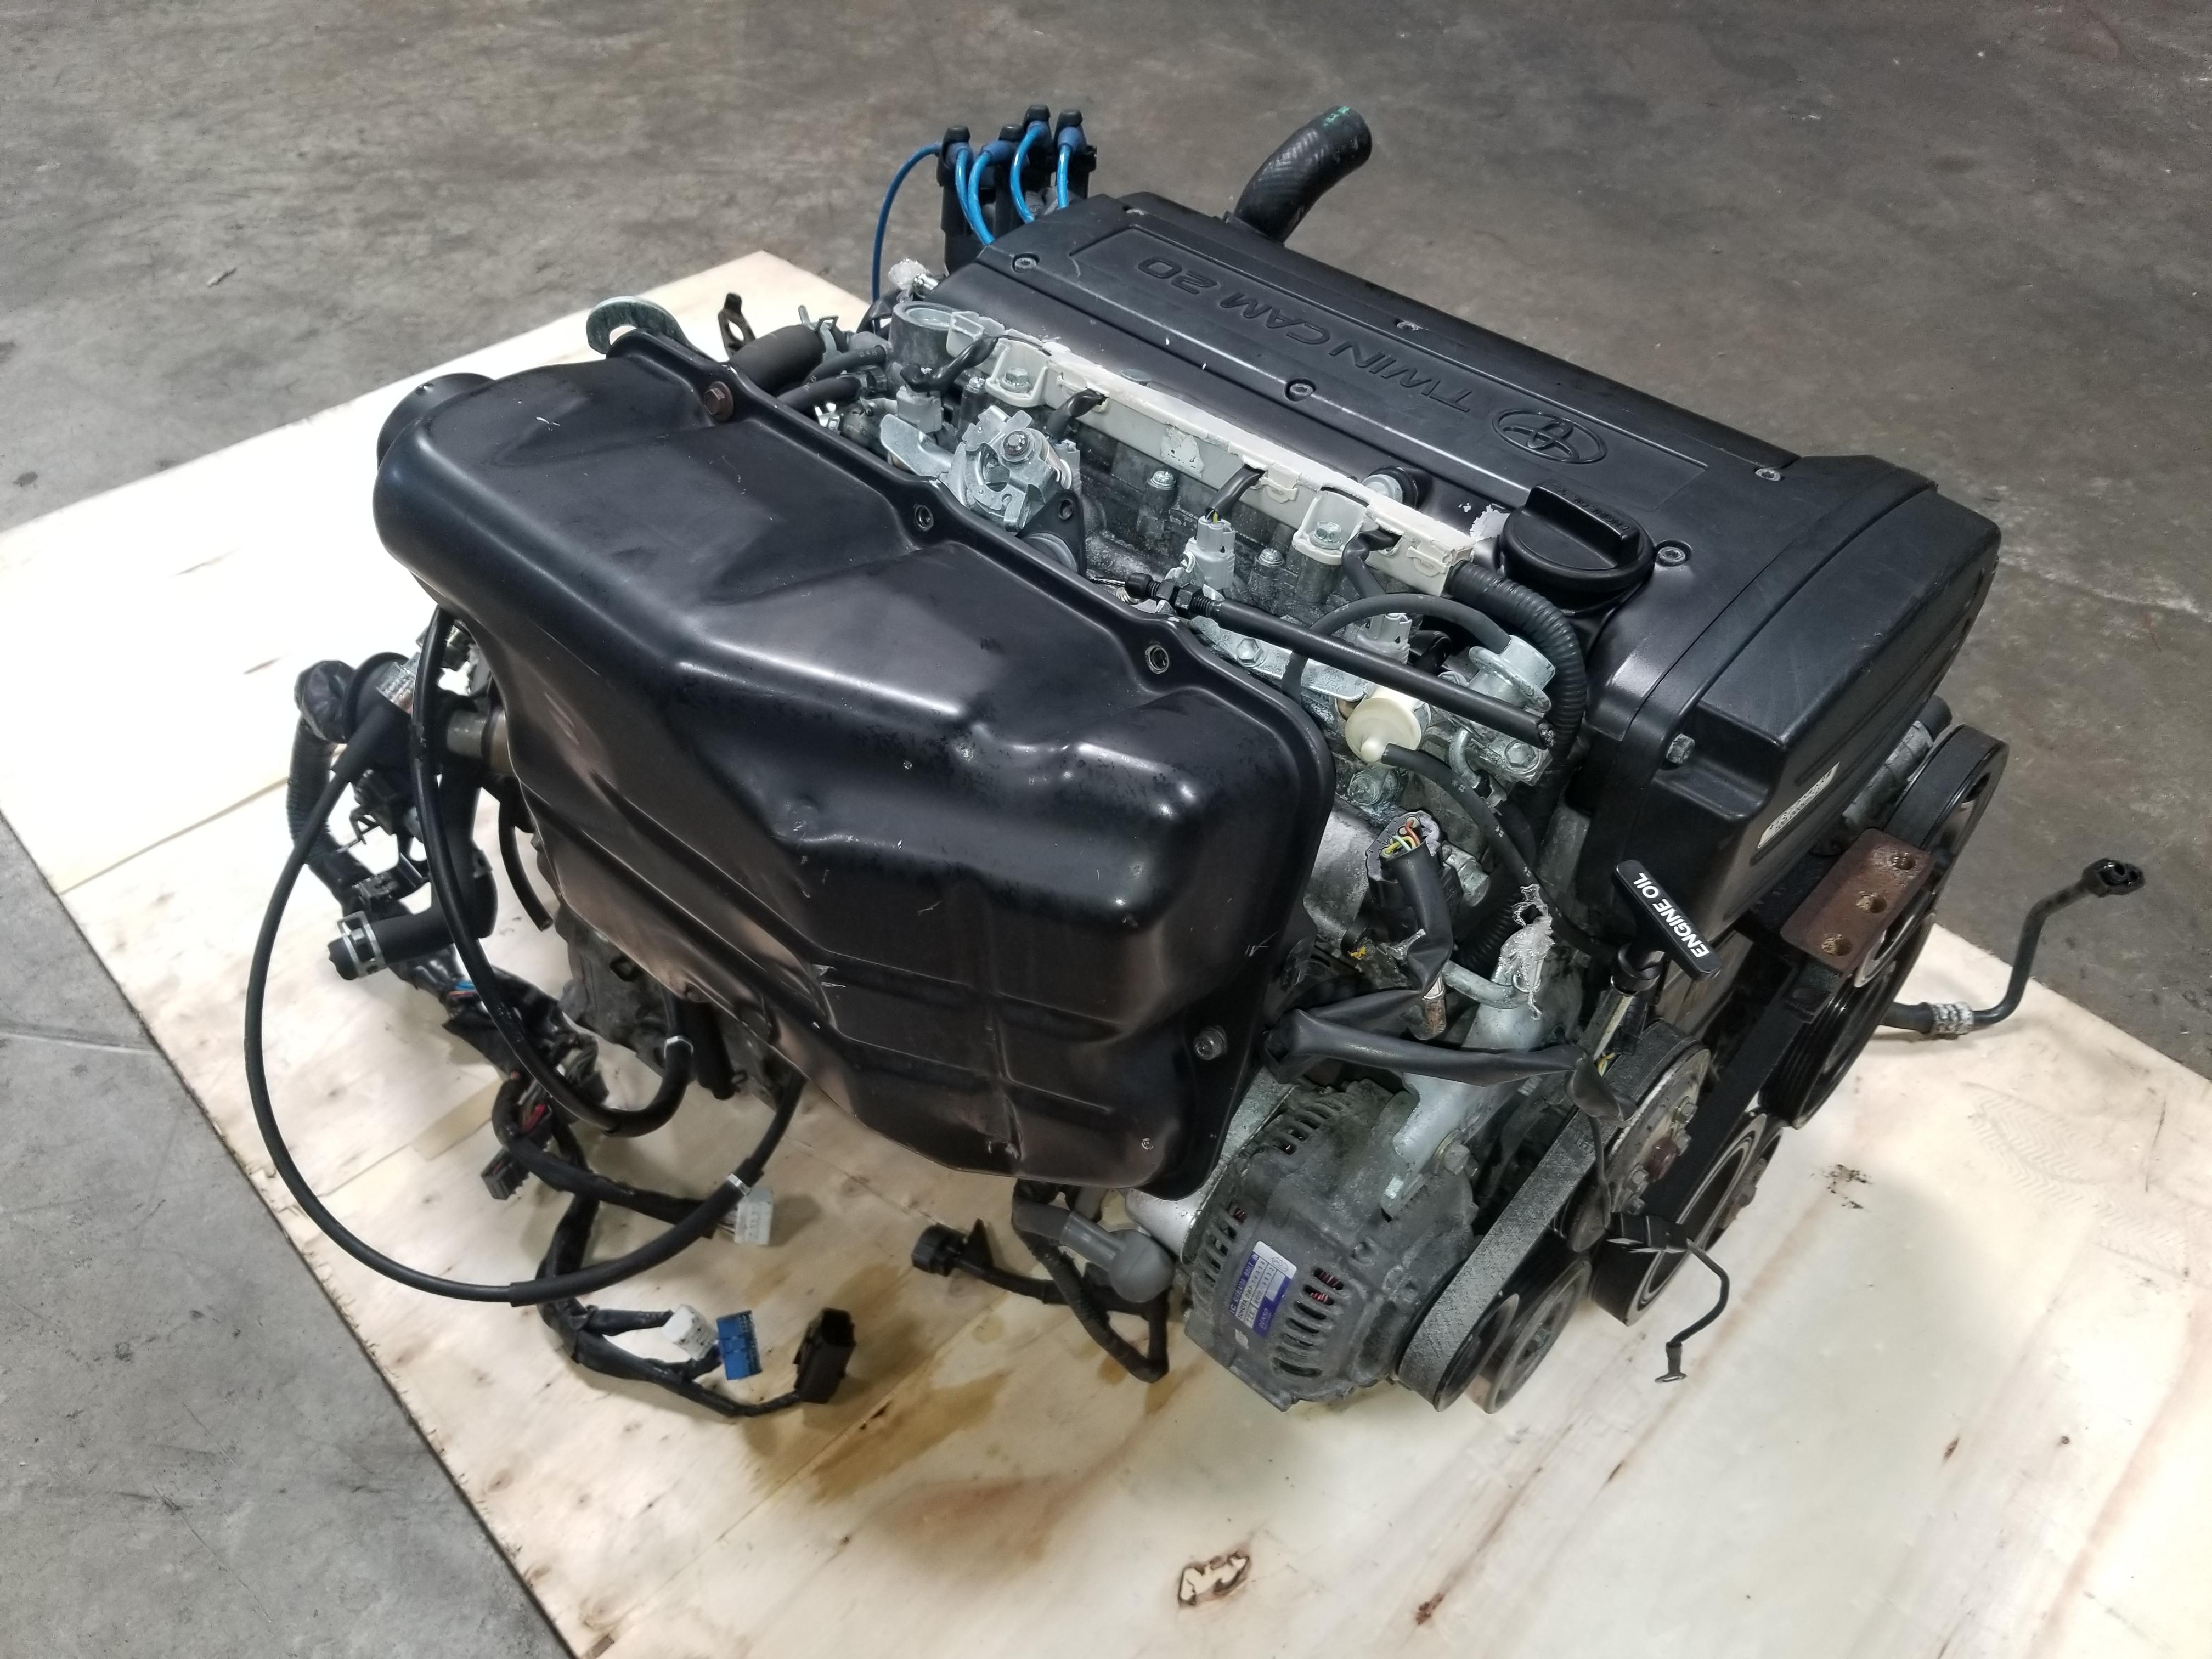 Nissan Chula Vista >> 4AGE 20V Blacktop Engine with 6 Speed Manual Transmission Toyota Corolla Trueno Levin AE111 ...